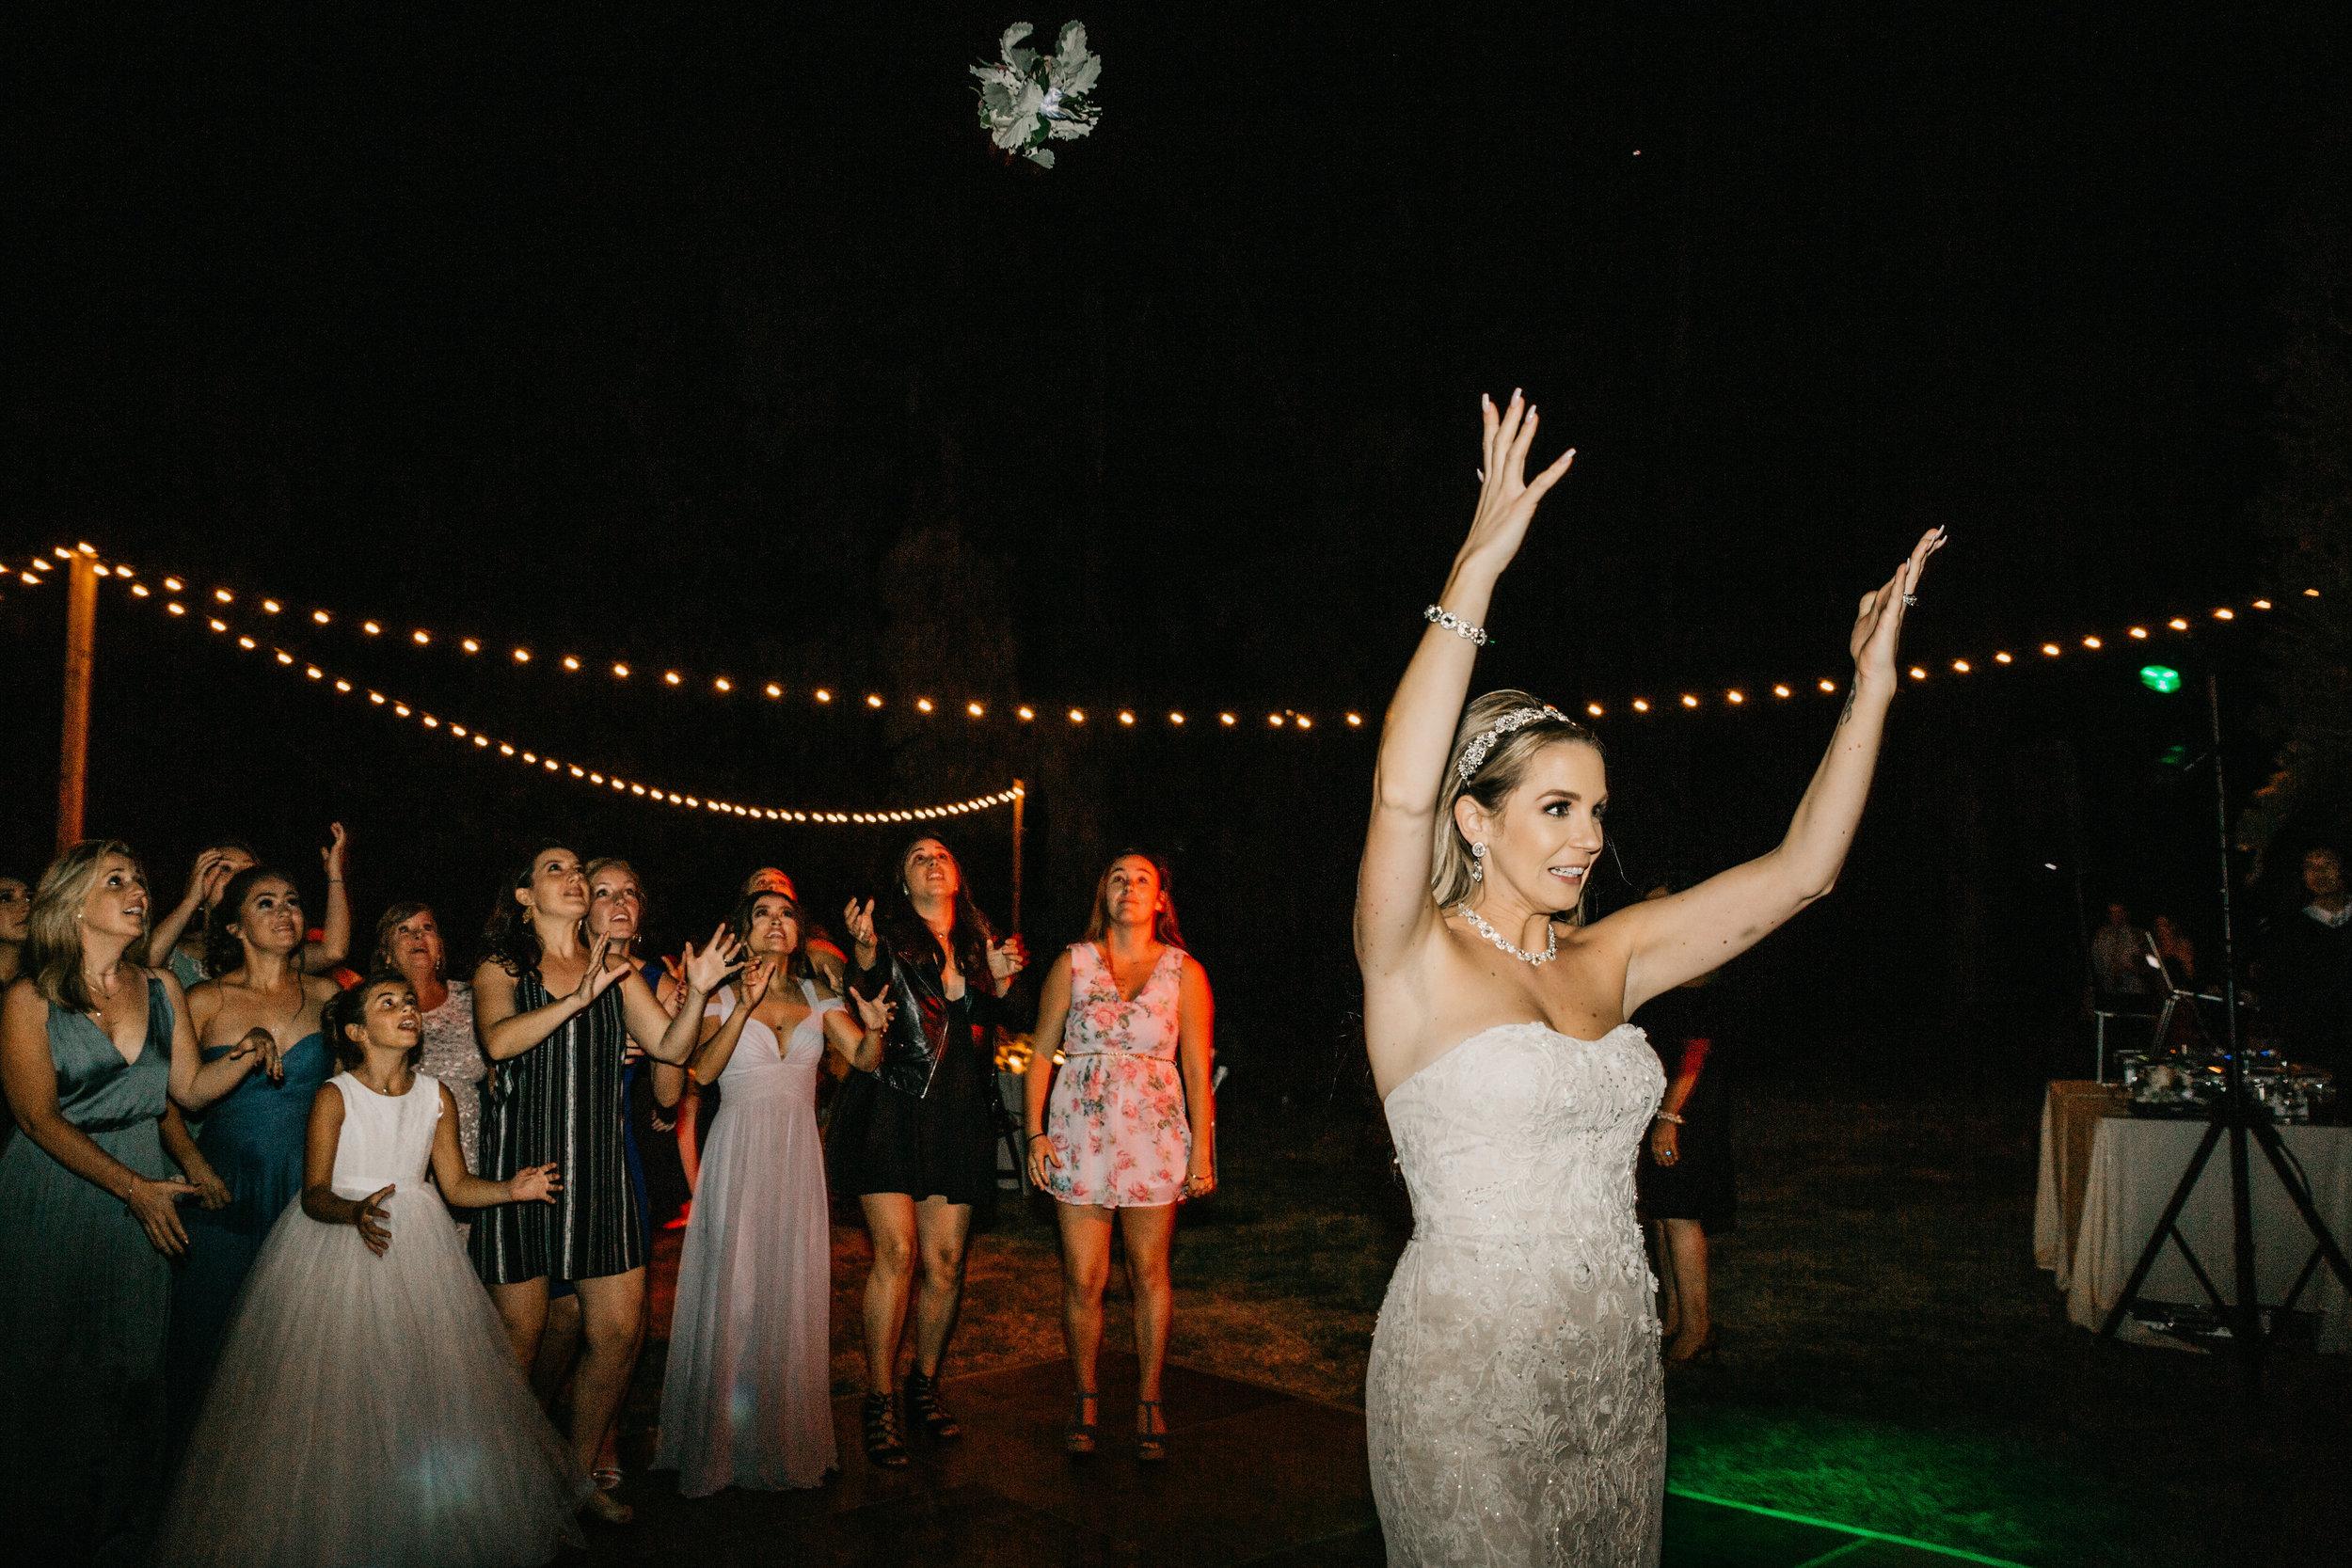 DianaLakePhoto-L+M-San-Diego-Wedding-Reception184.jpg